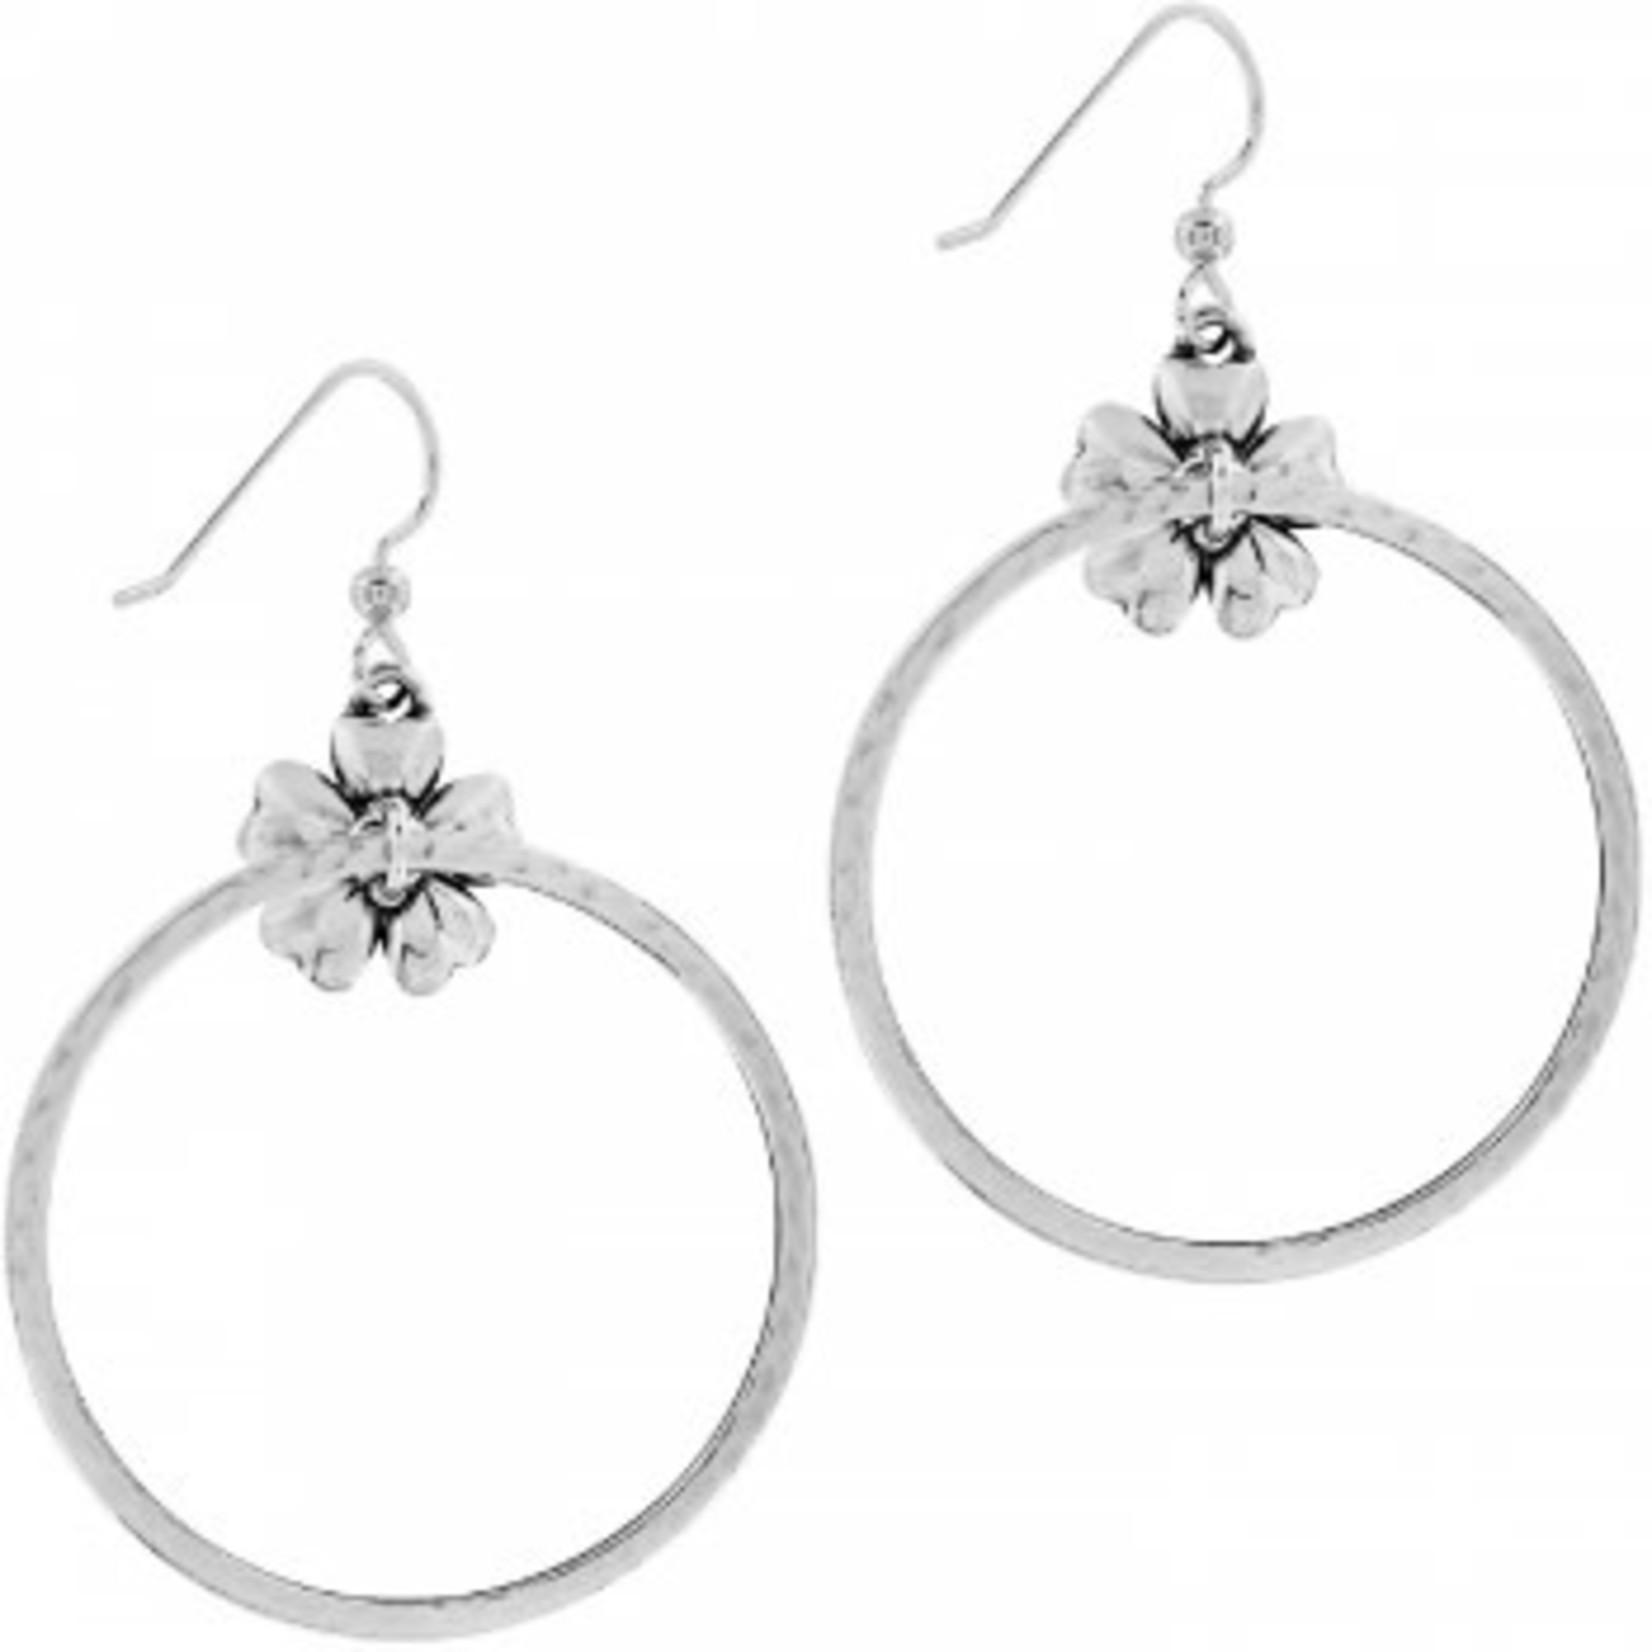 Brighton Flora French Wire Hoop Earrings